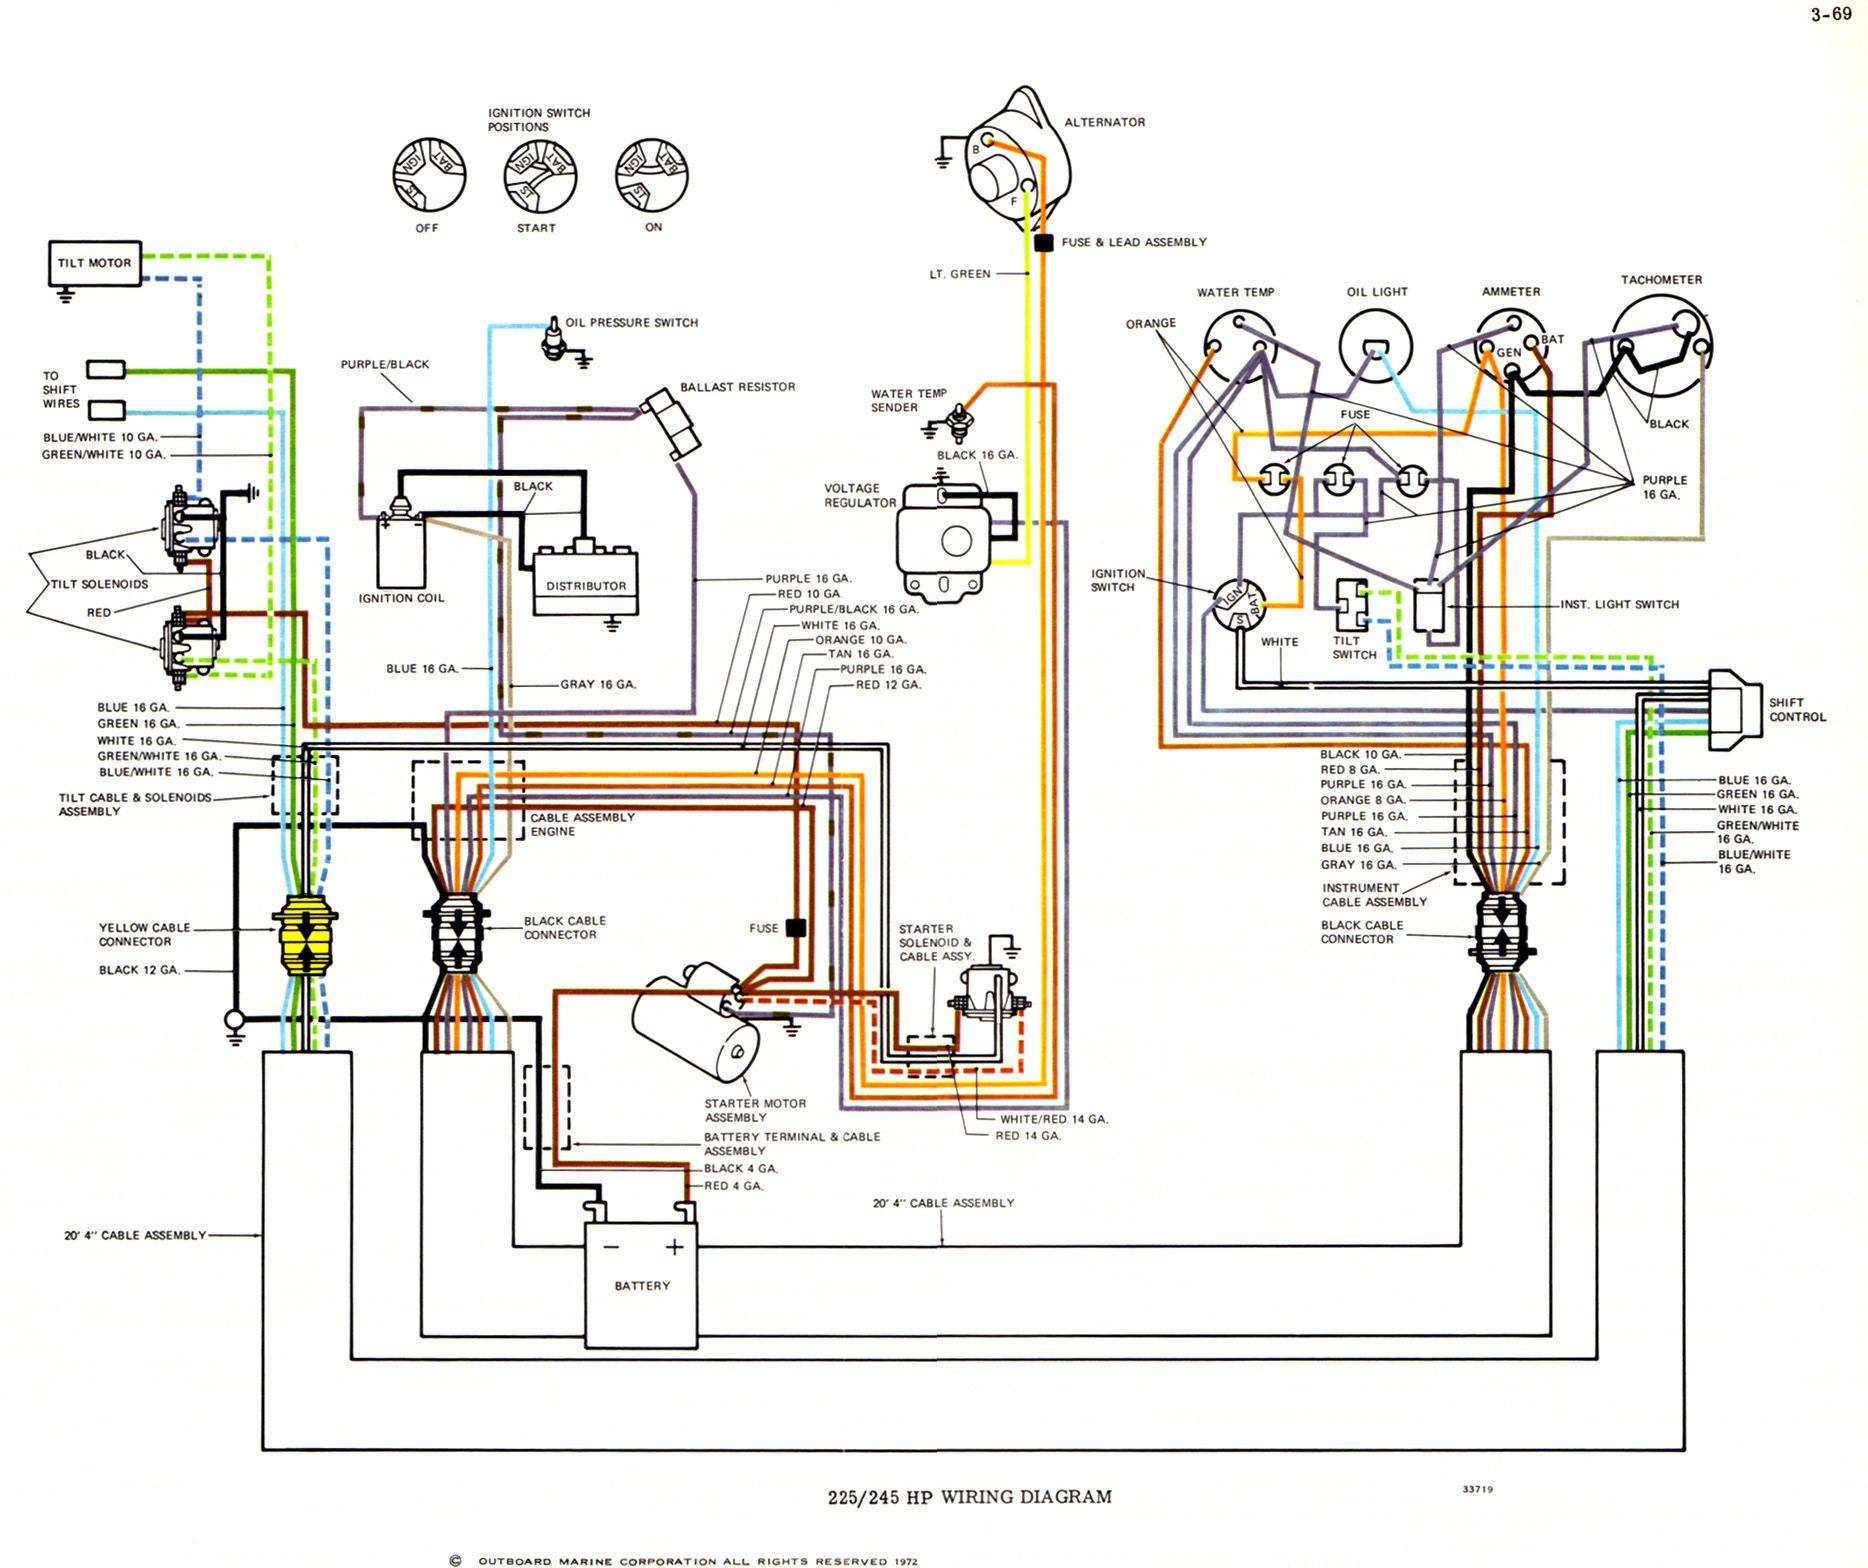 simple house wiring diagram. Black Bedroom Furniture Sets. Home Design Ideas